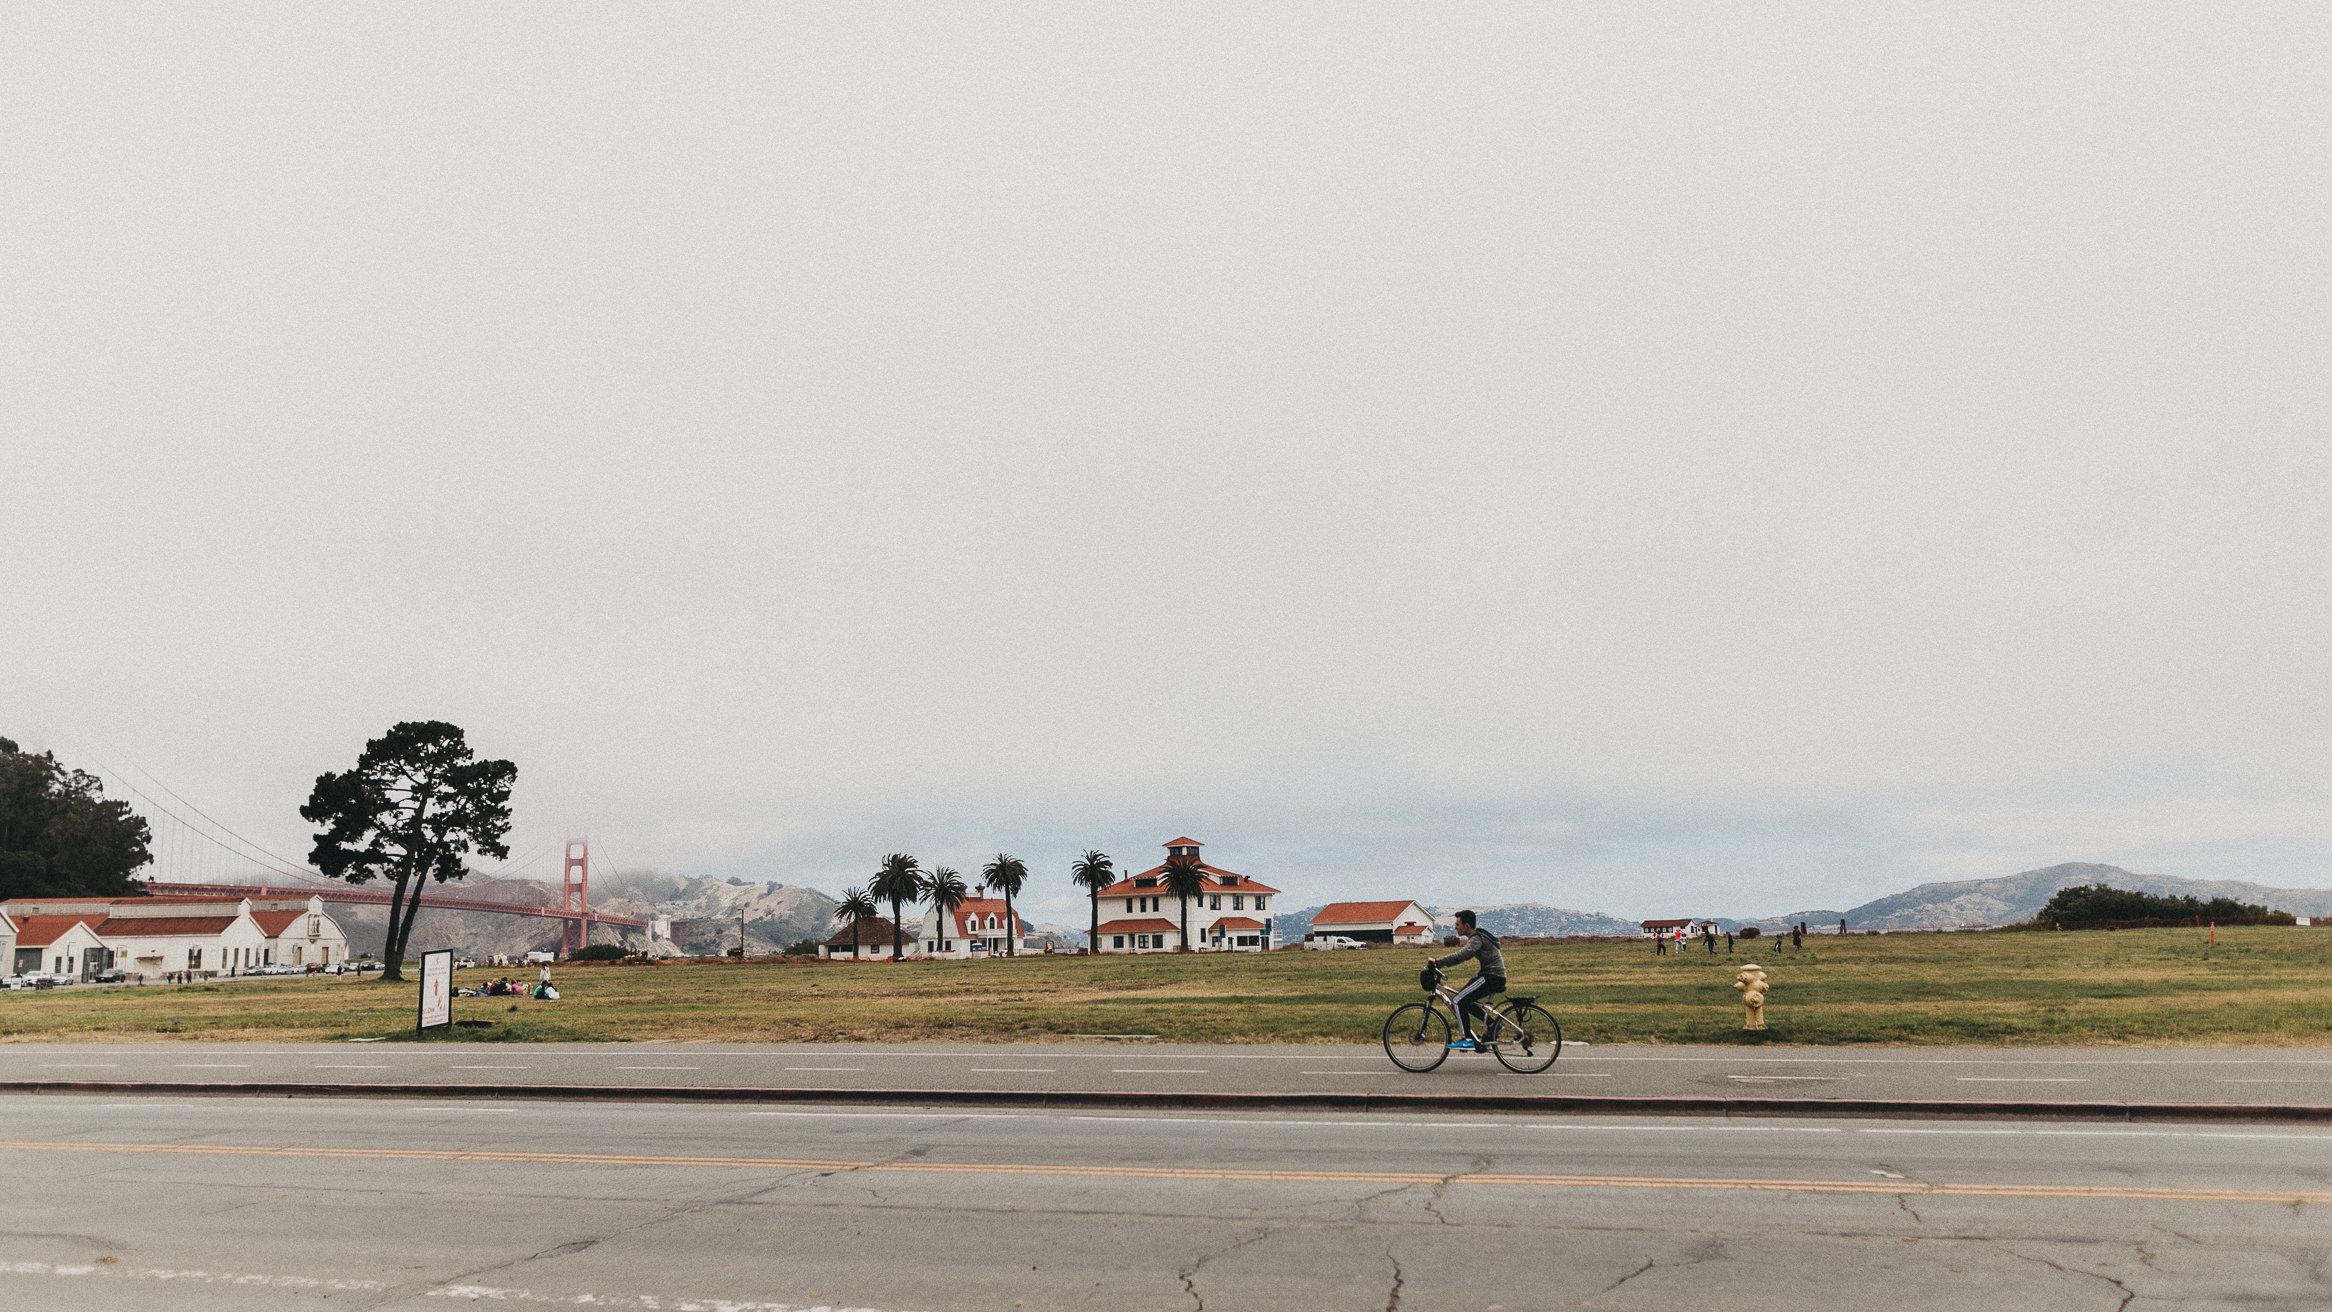 San-Francisco-BildervomLeben-7645